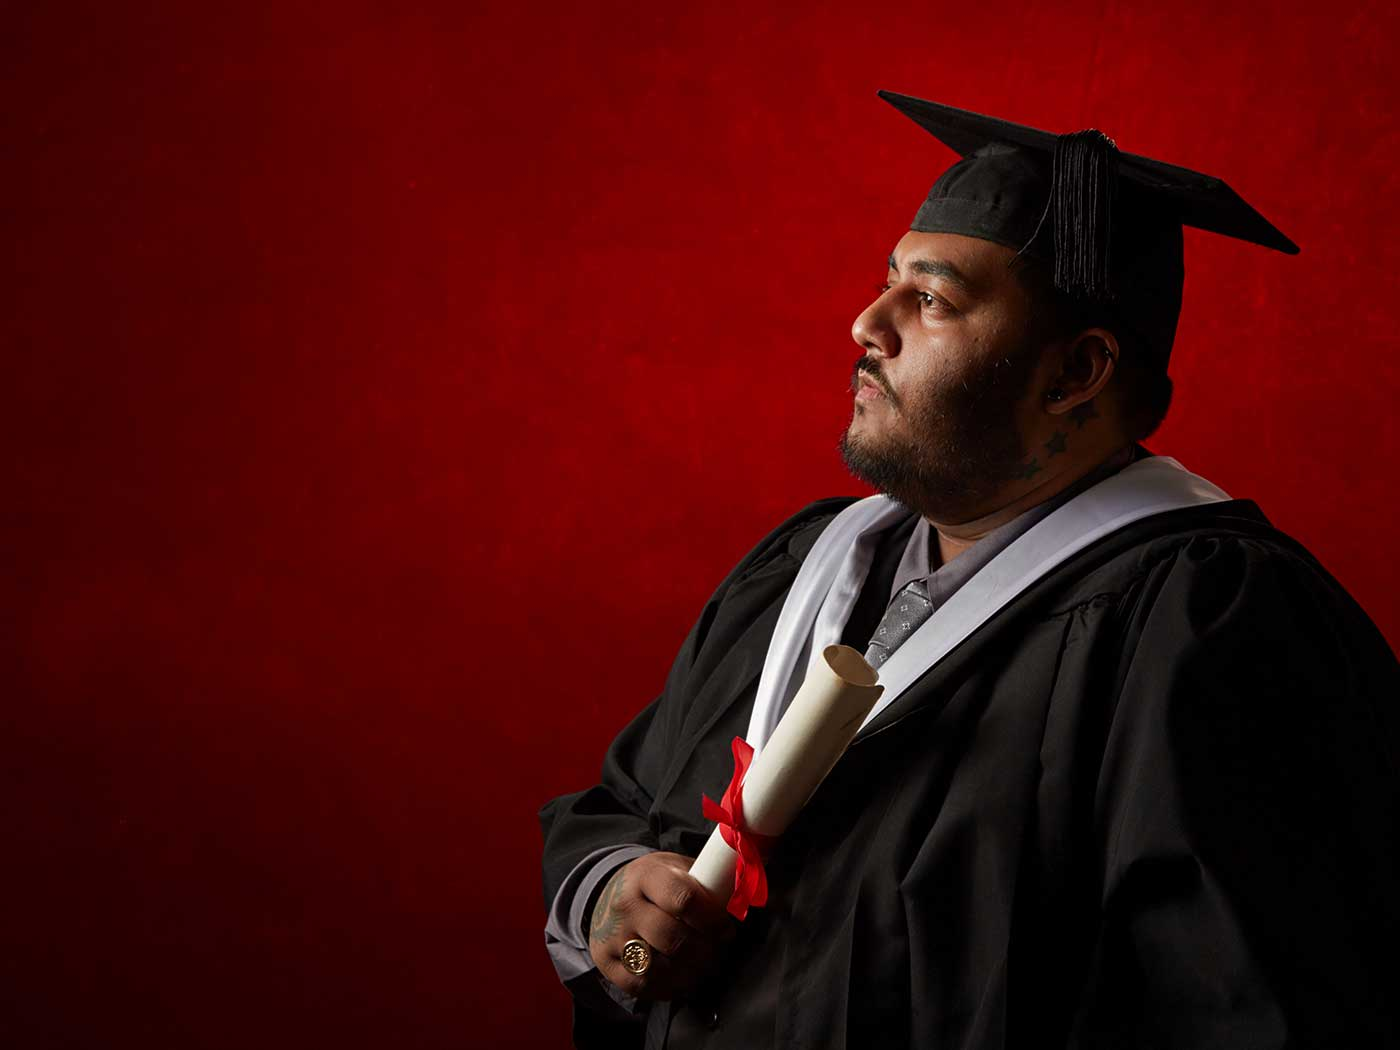 Graduation Photographers in London - row3